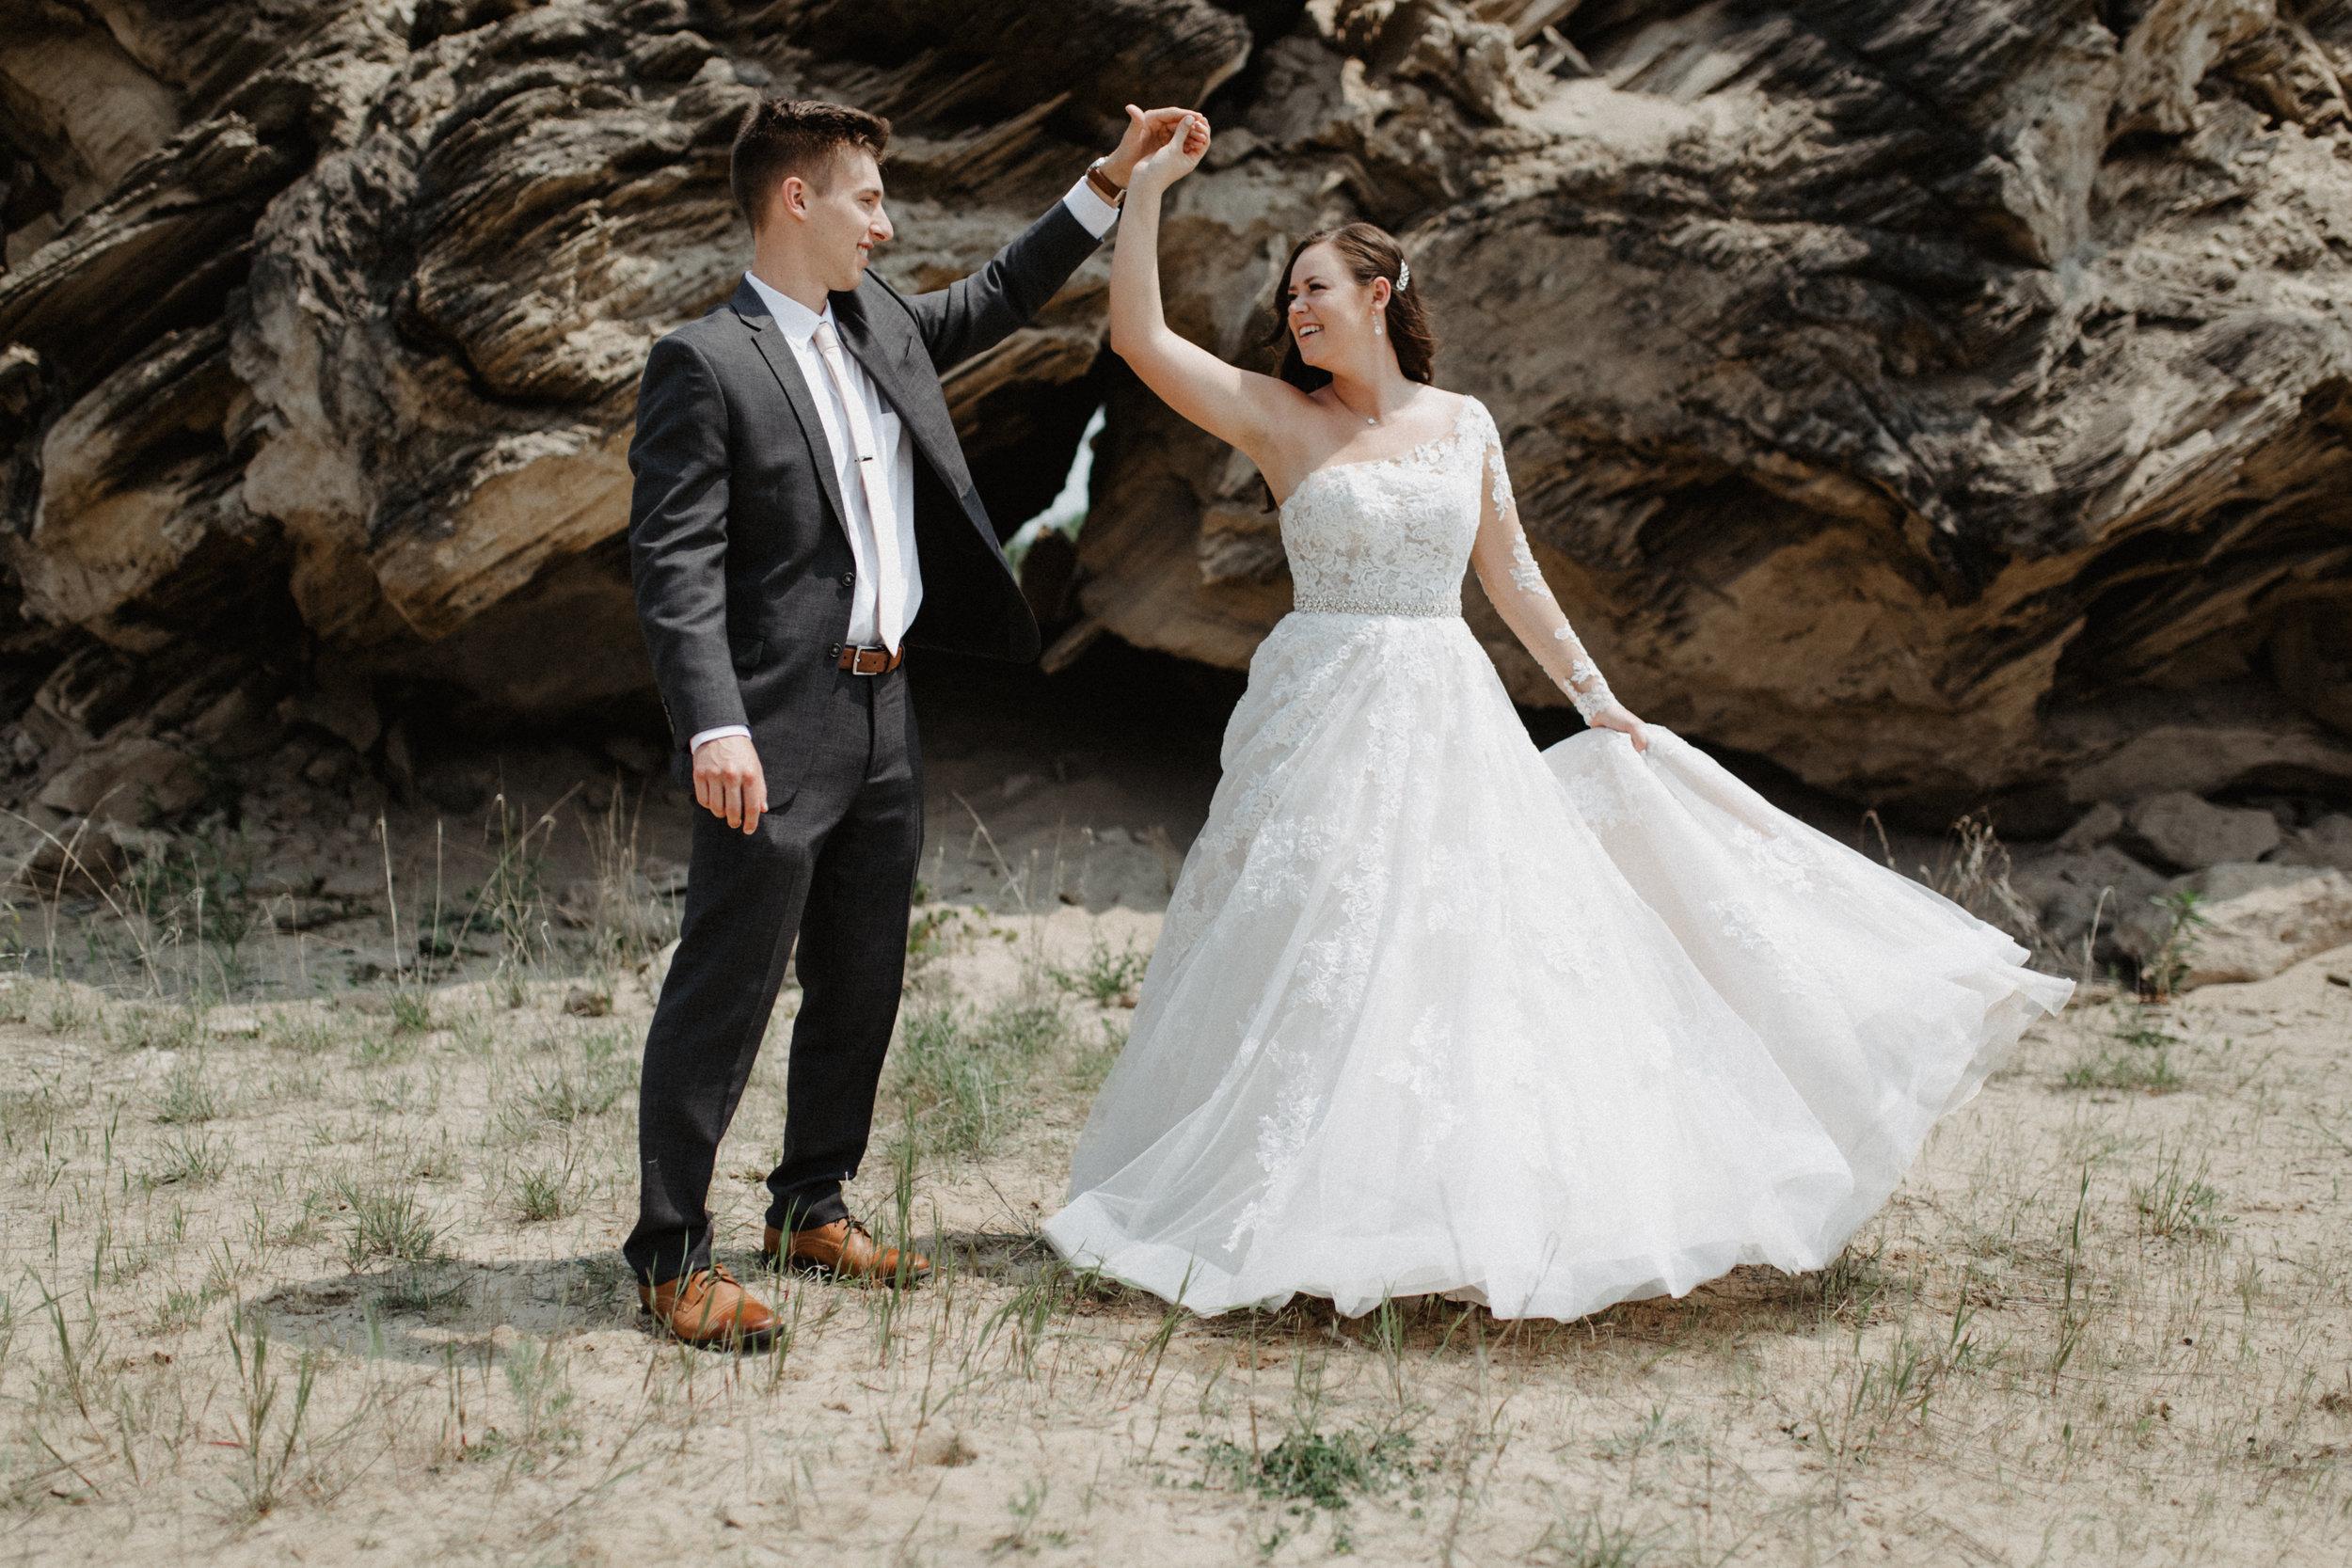 GRAYCENTOMHAMILTON-GRAND-RAPIDS-WEDDING-PHOTOGRAPHY-24.jpg